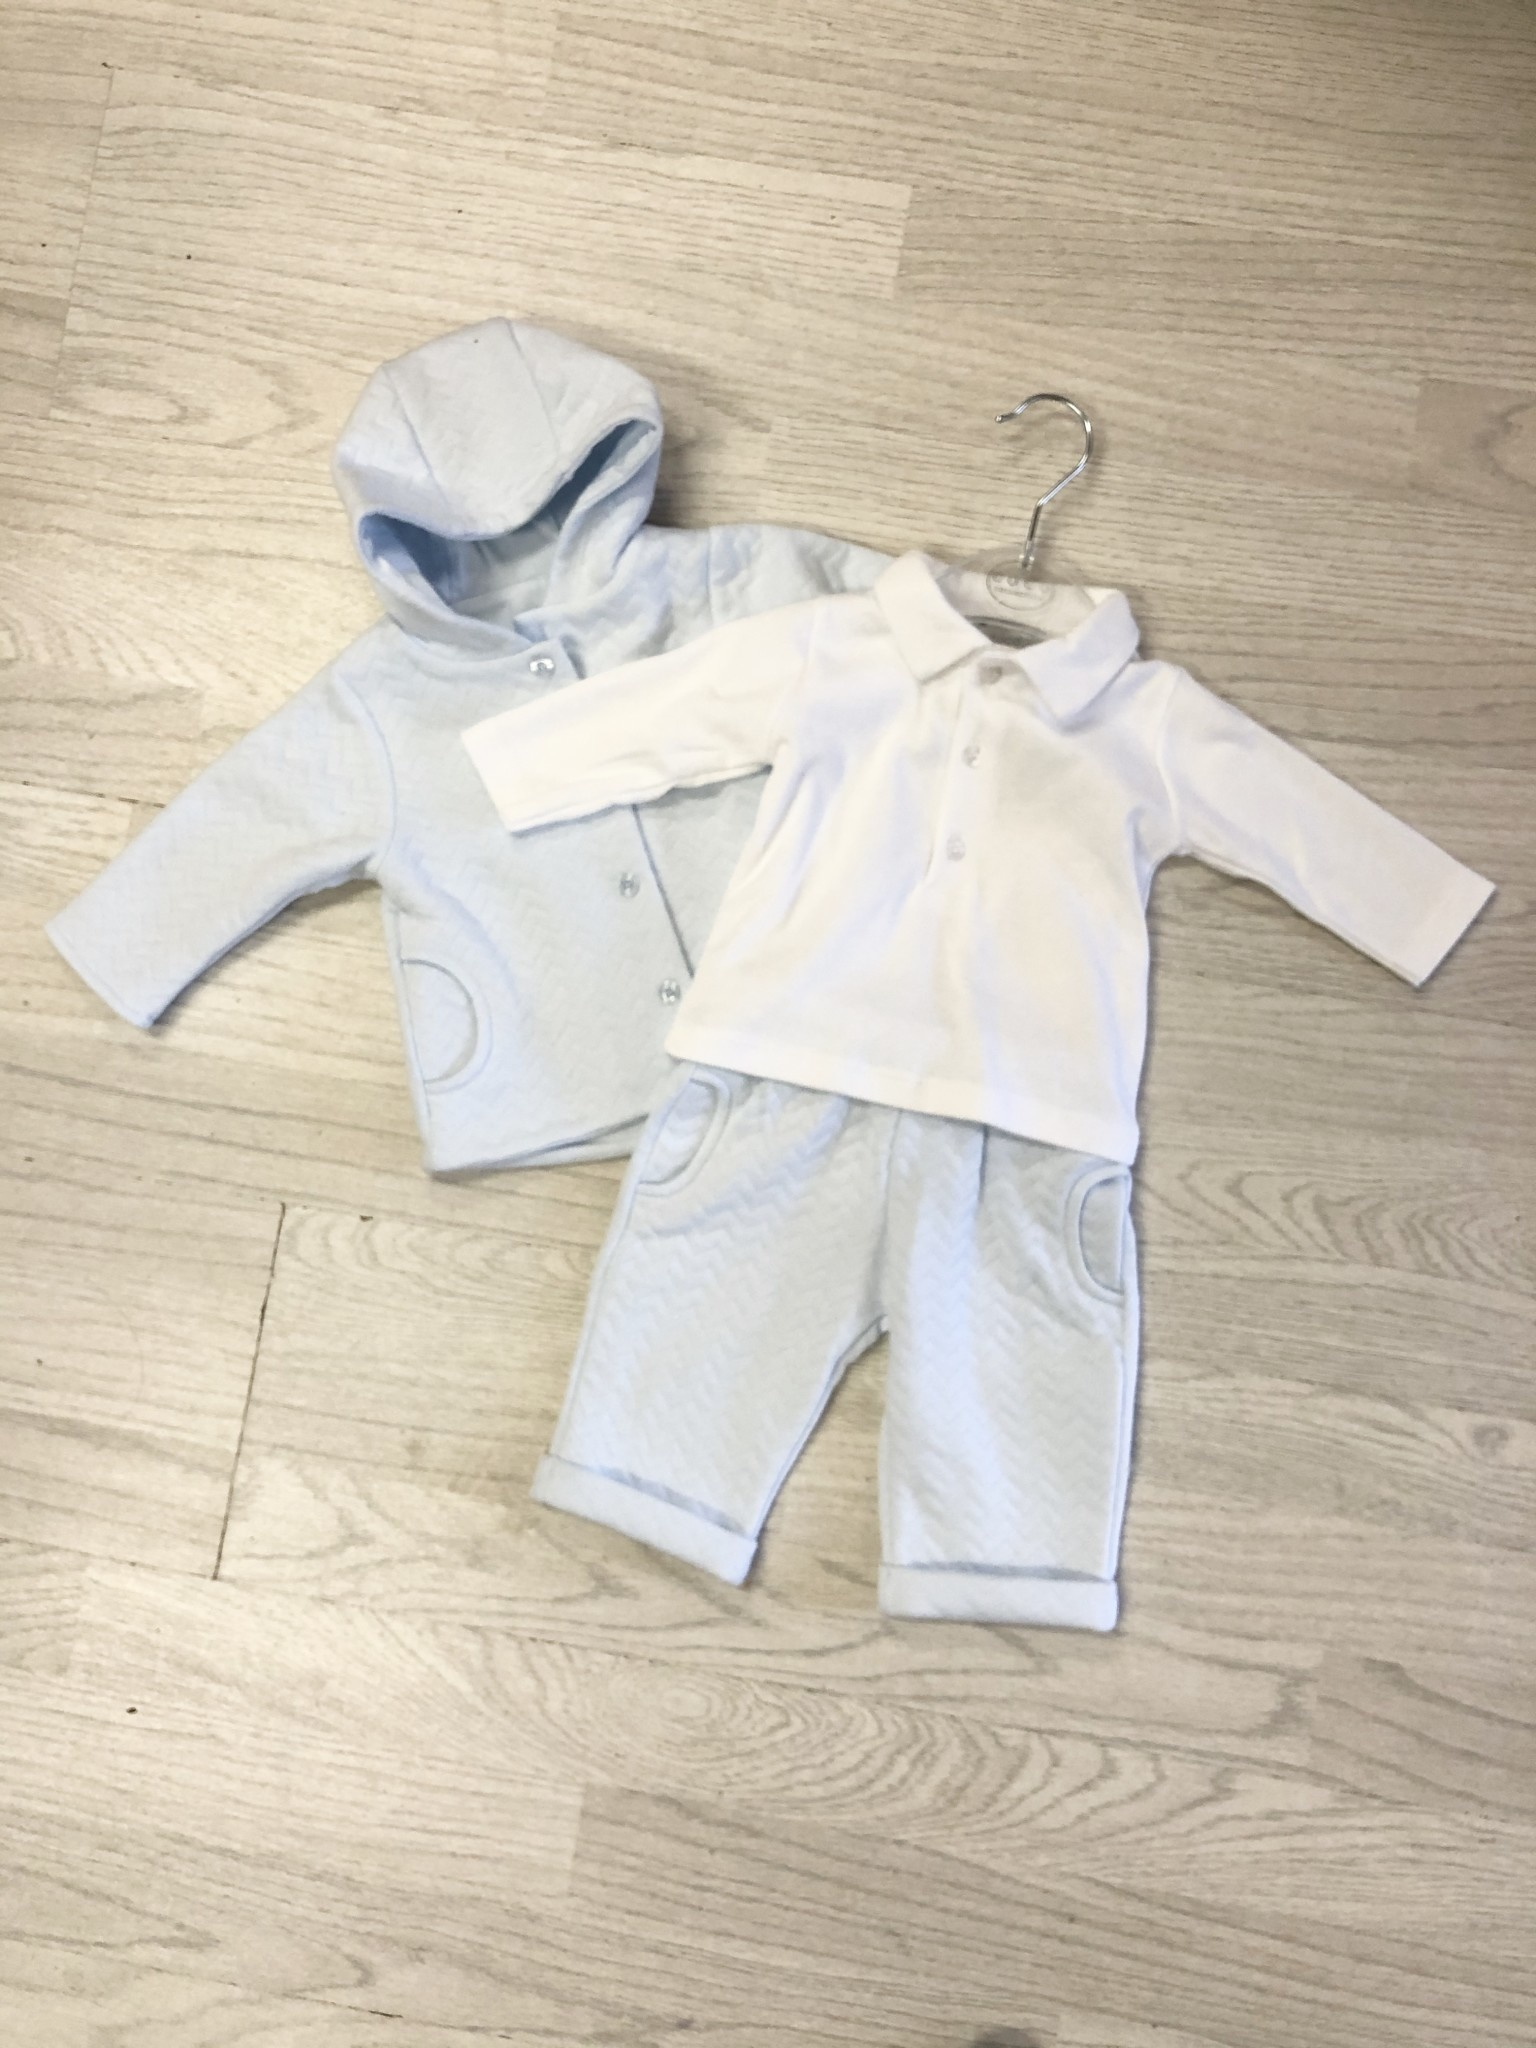 Coco Collection CoCo Boys Chevron 3 Piece Suit, Pale Blue / White